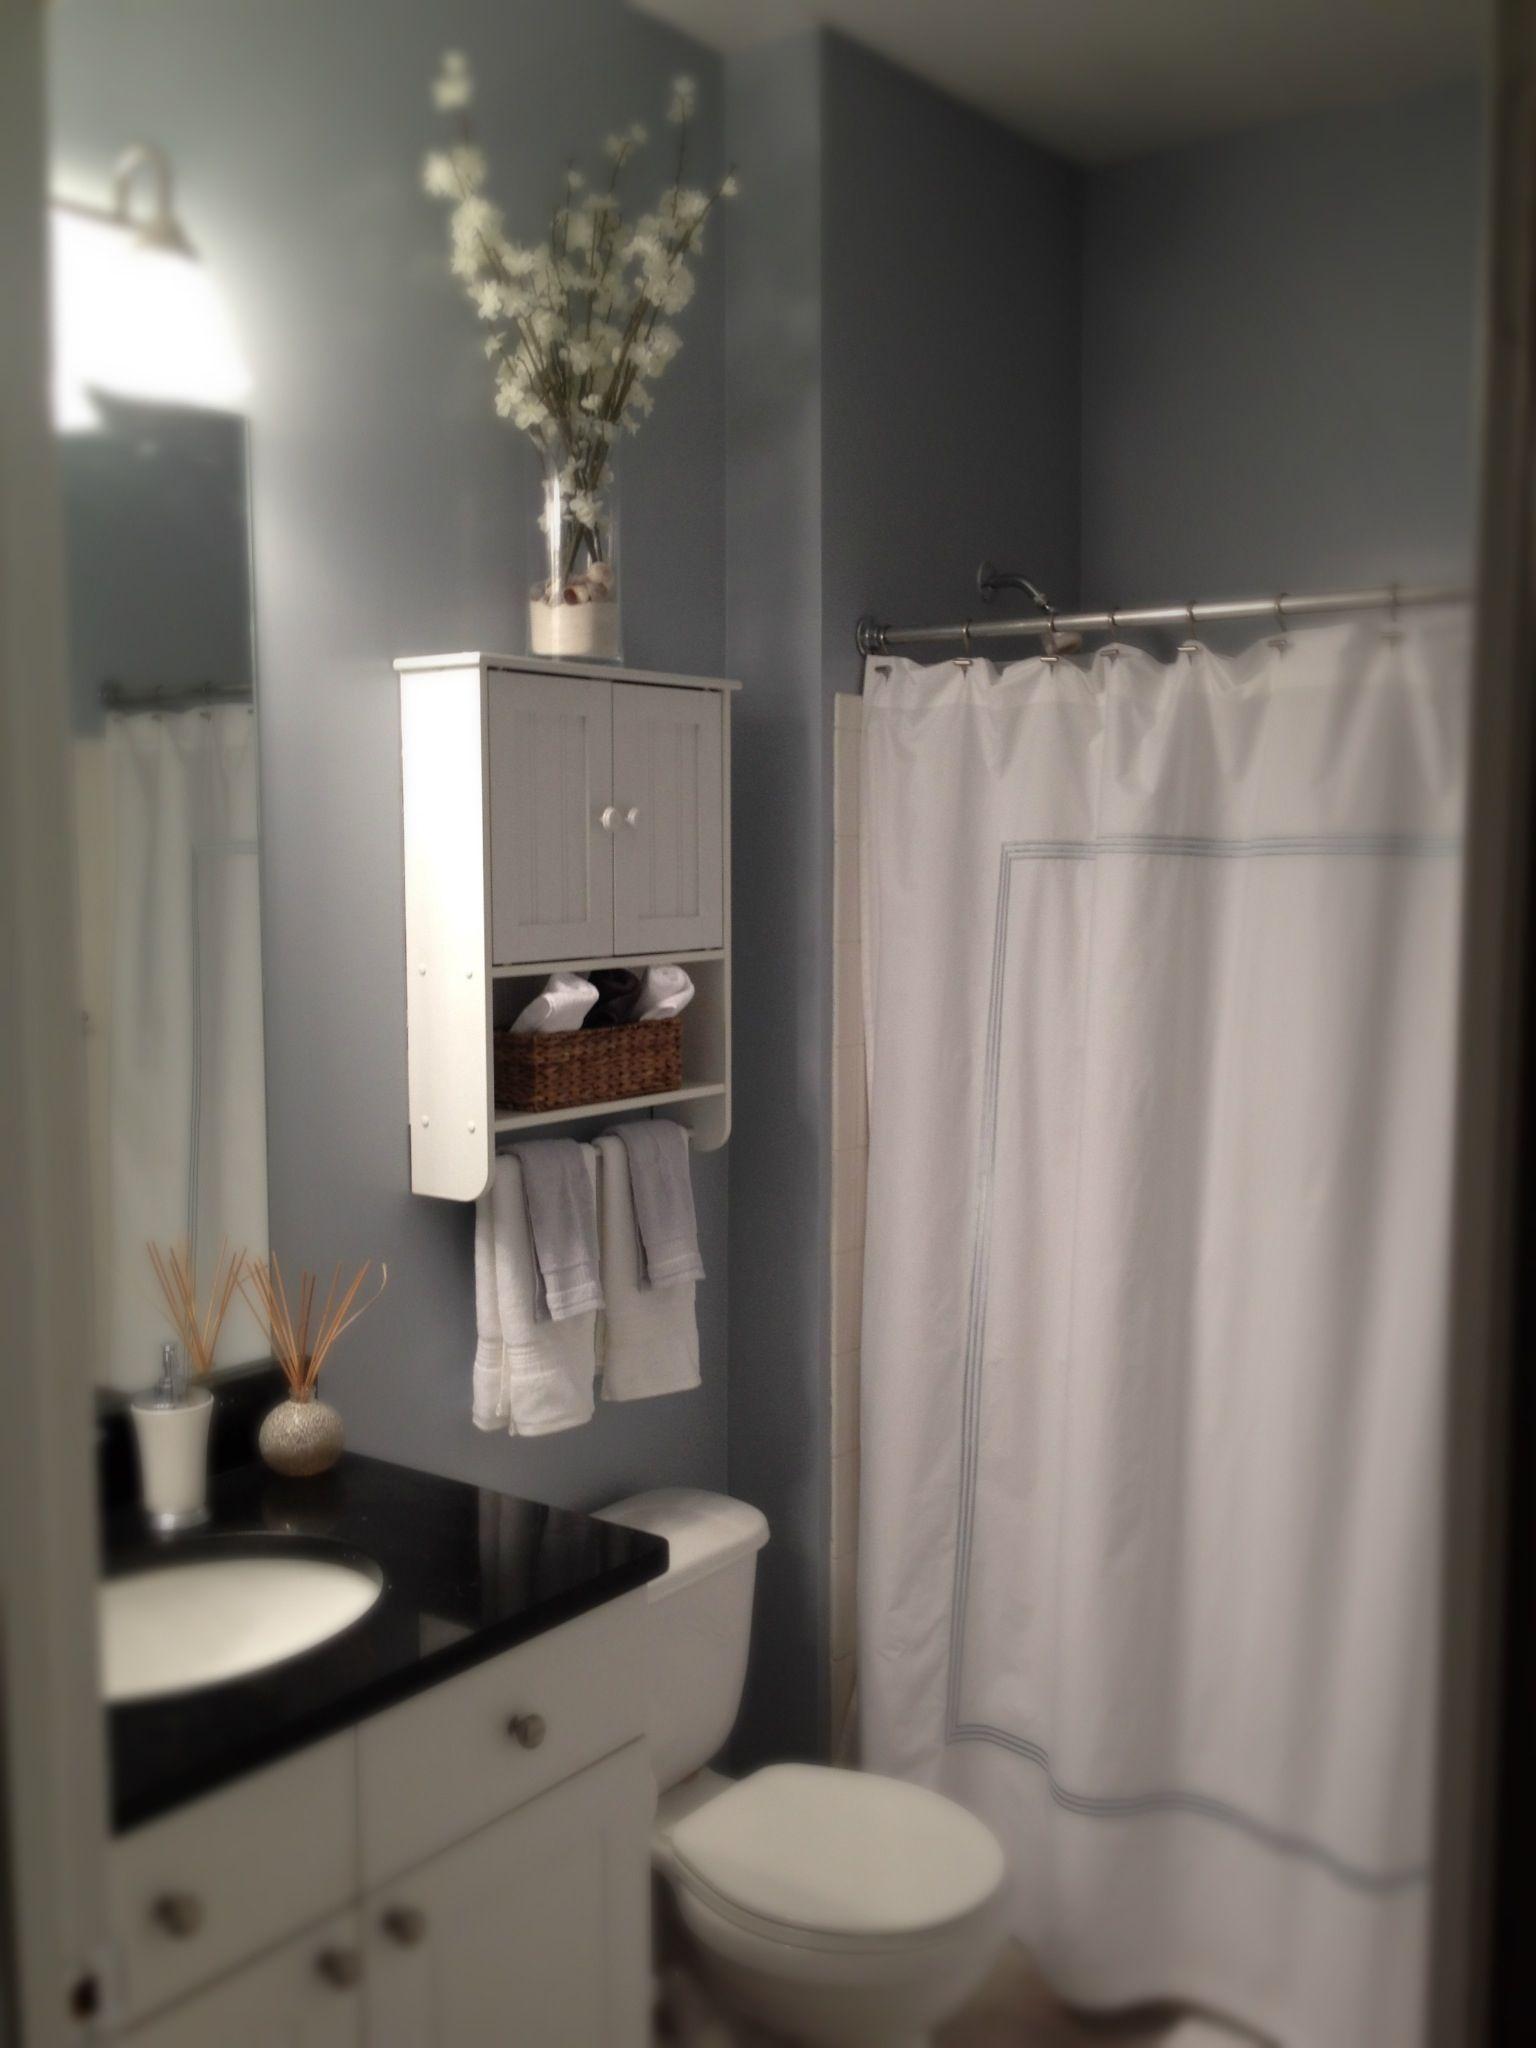 Pottery Barn bathroom.Shelf above toilet | bathroom | Pinterest ...